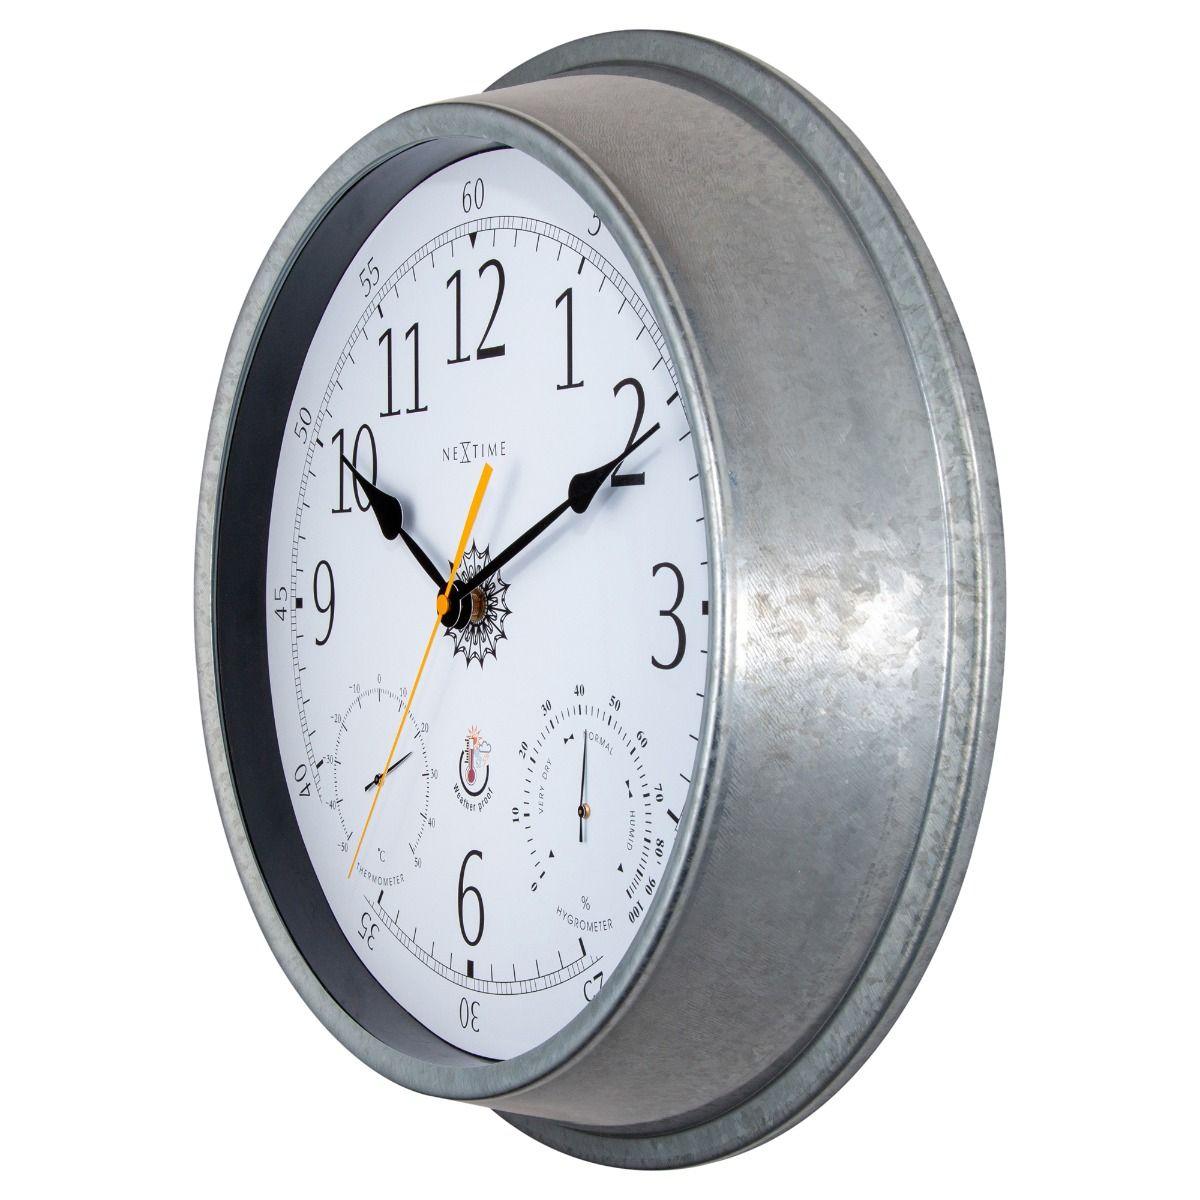 Galvanised Metal NeXtime Outdoor Wall Clock